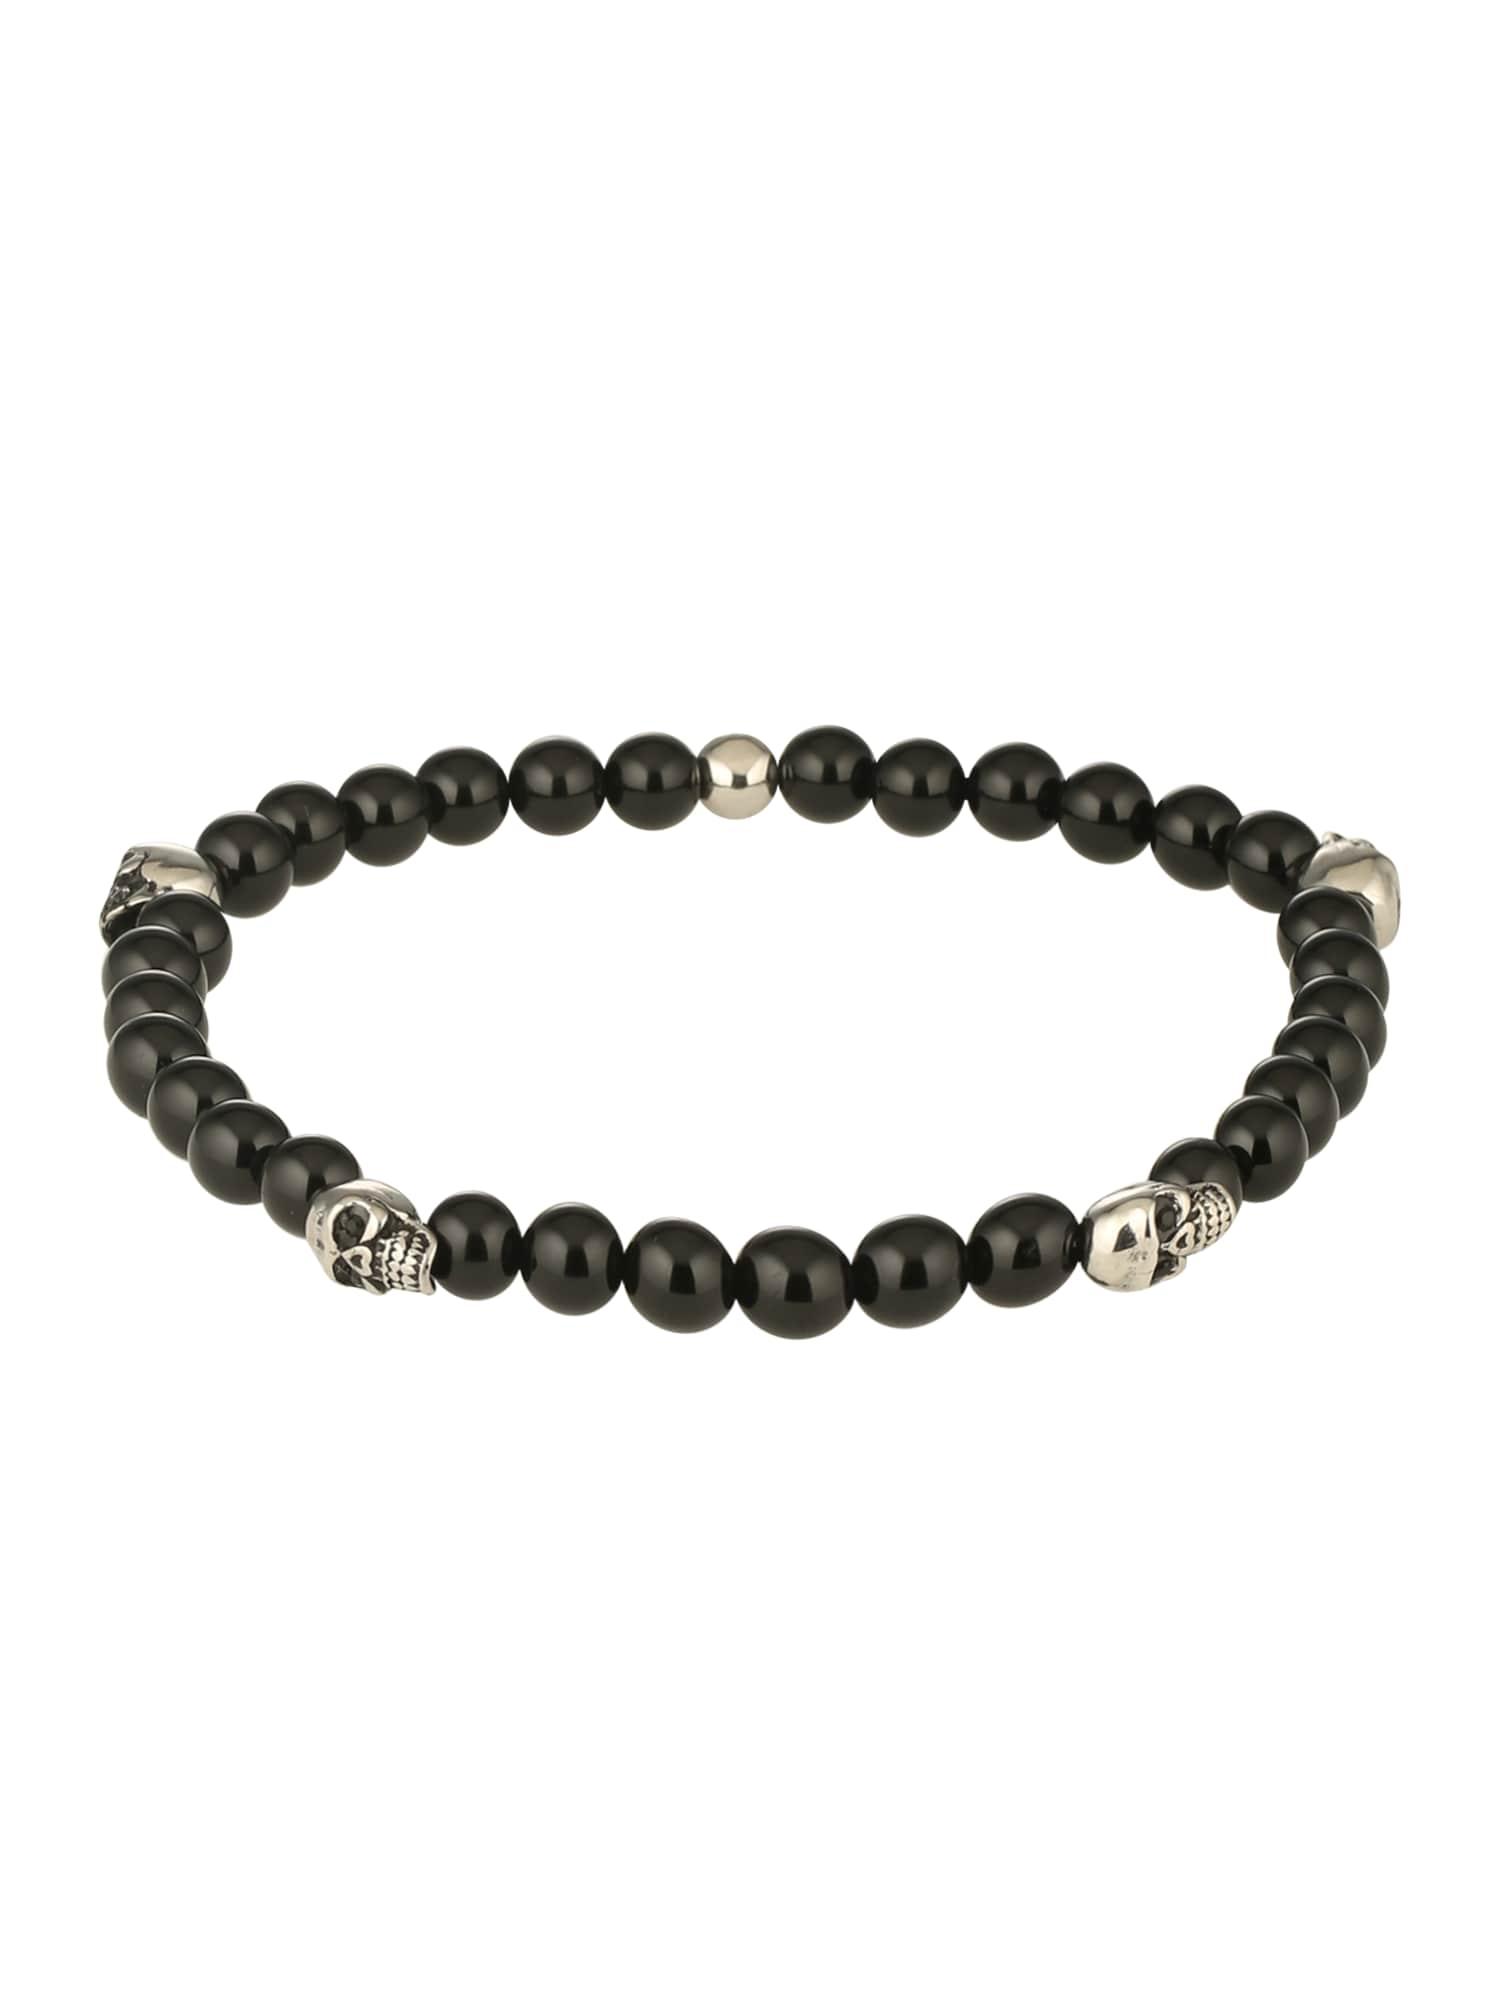 Náramek Bracelet Lava Bead Skull  černá stříbrná ROYAL-EGO